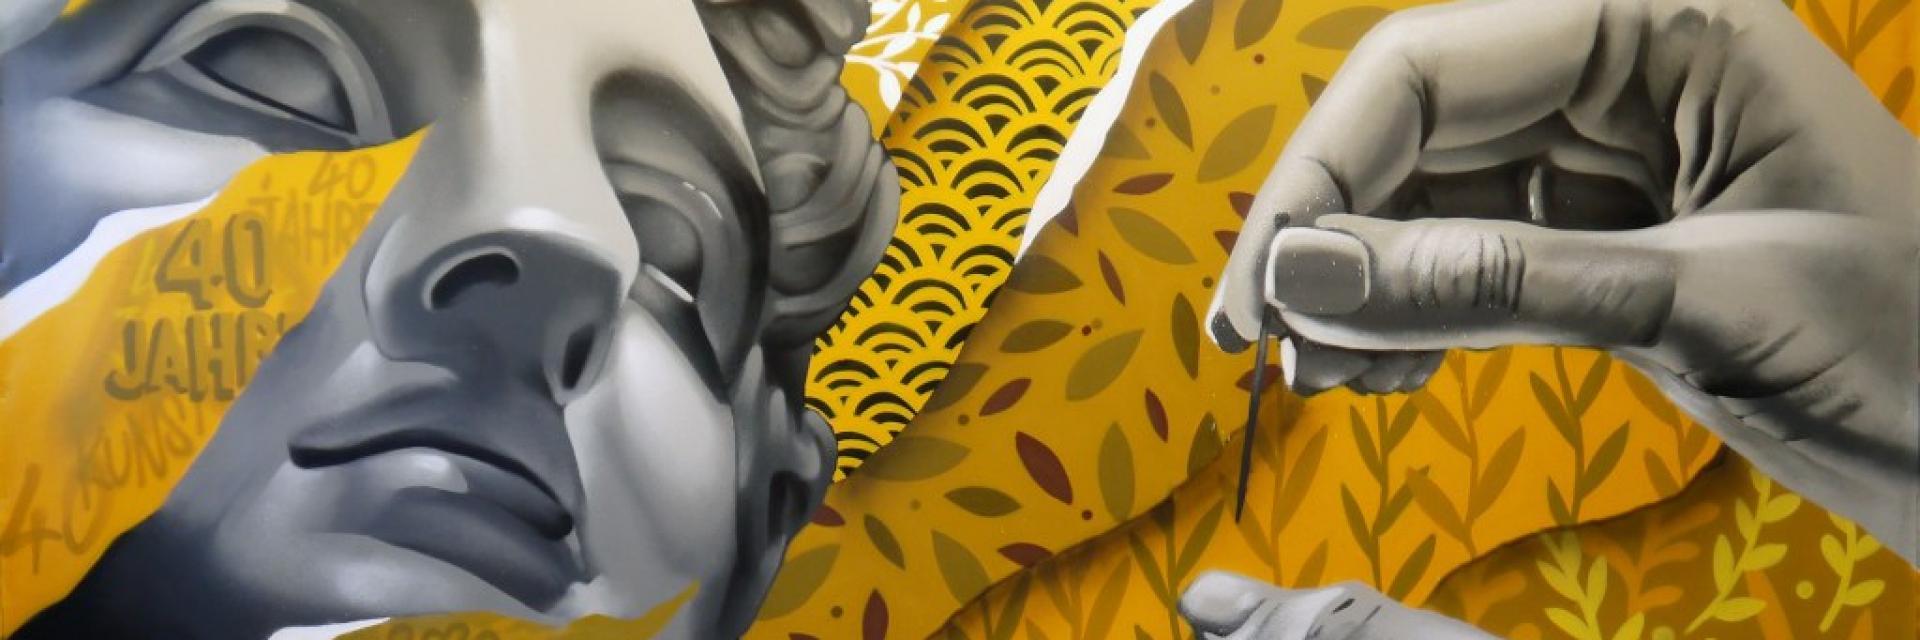 Bagnoles Orne Collectif 100 Pression Artiste Graffeur Tag Peinture Oeuvre Smoka Toile Visage Street Art